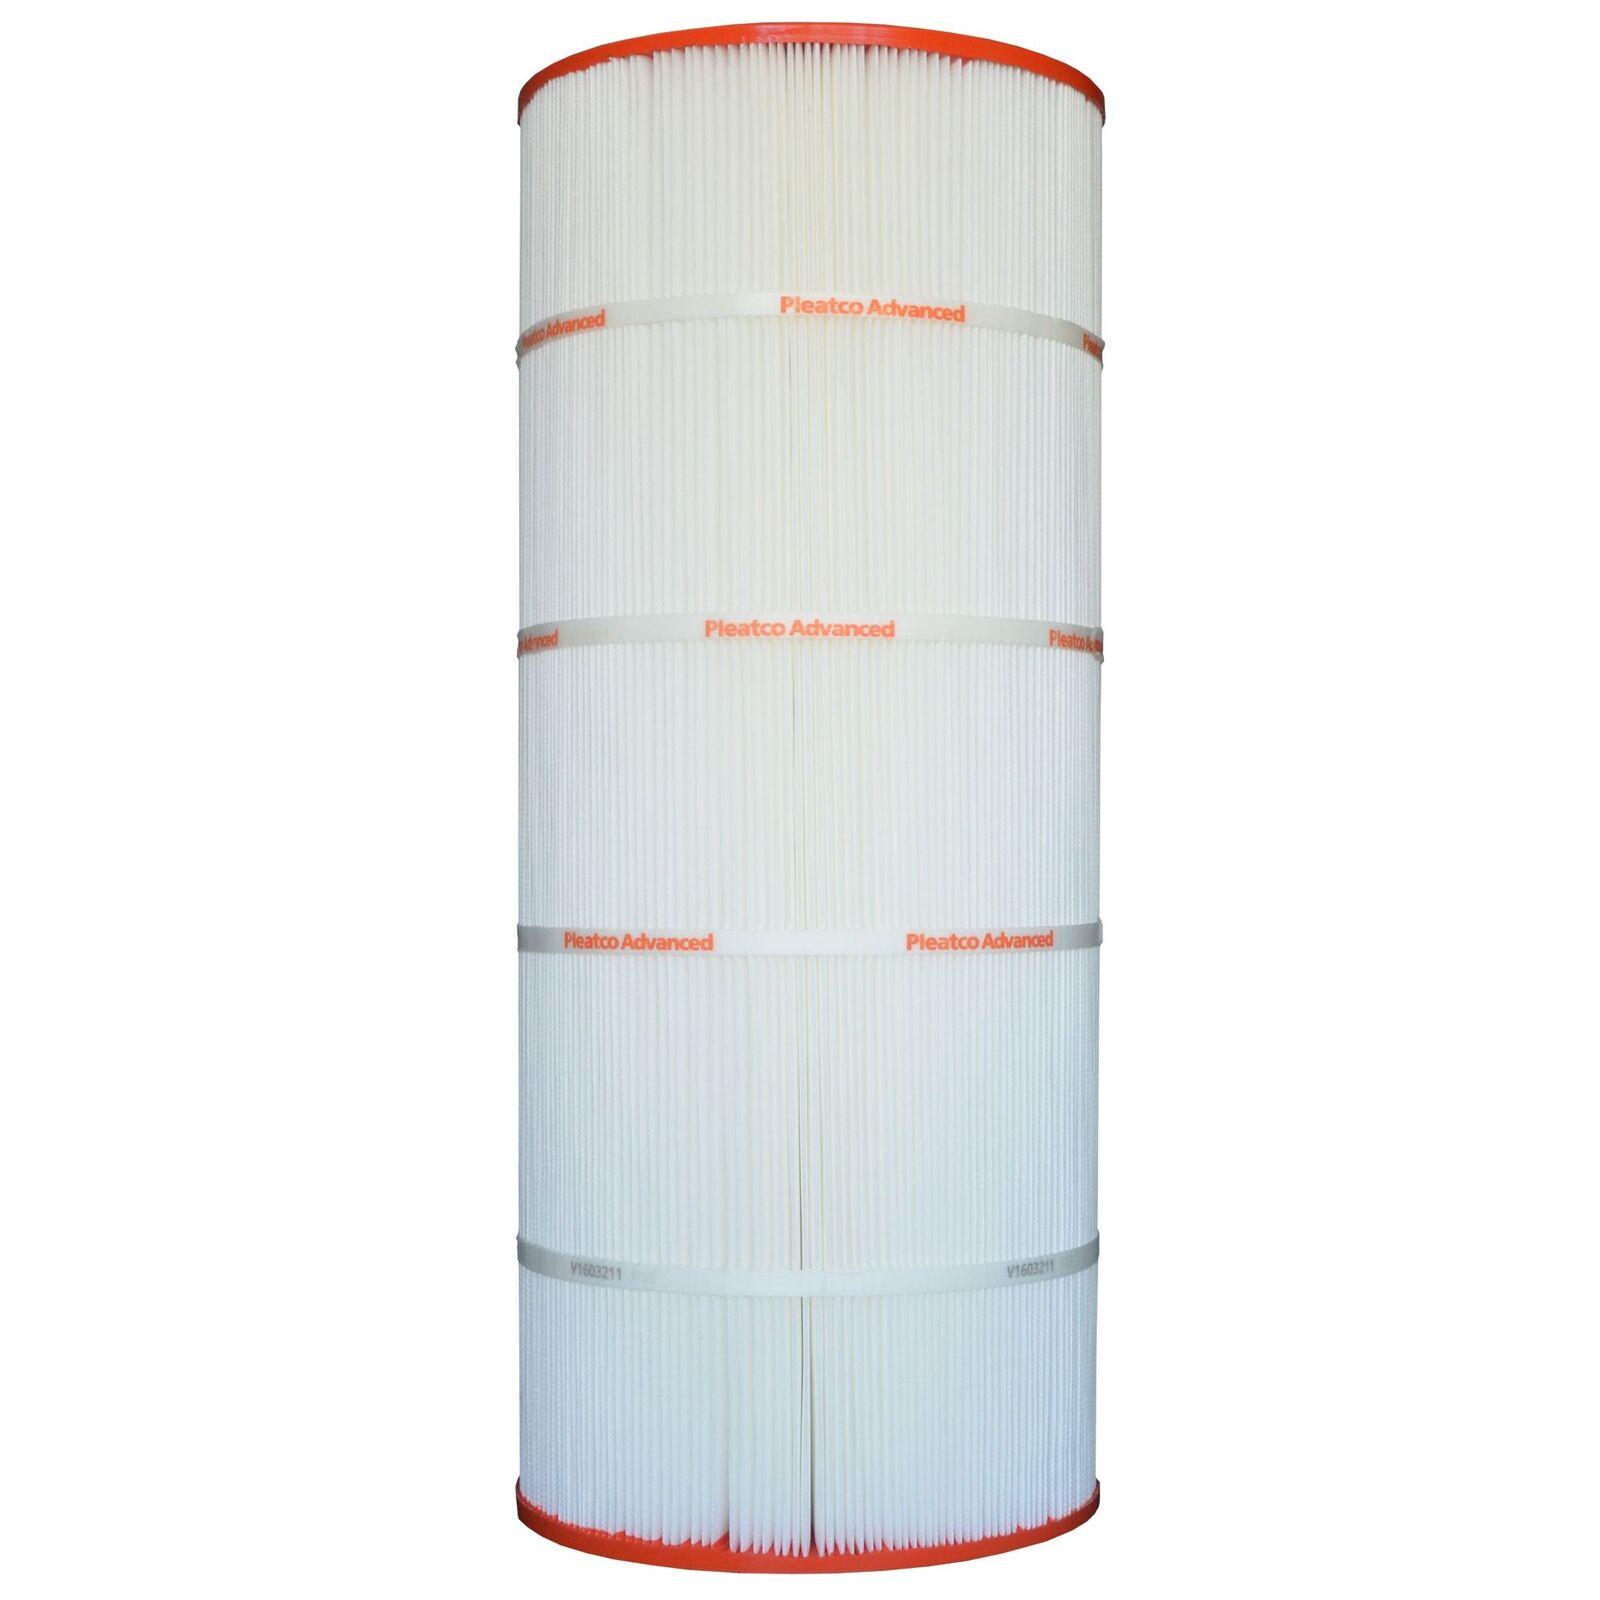 Pleatco PAP100-4 Pool Spa Filter Filter Filter Pentair Cartridge C-9410 Clean & Clear FC-0686 79113d